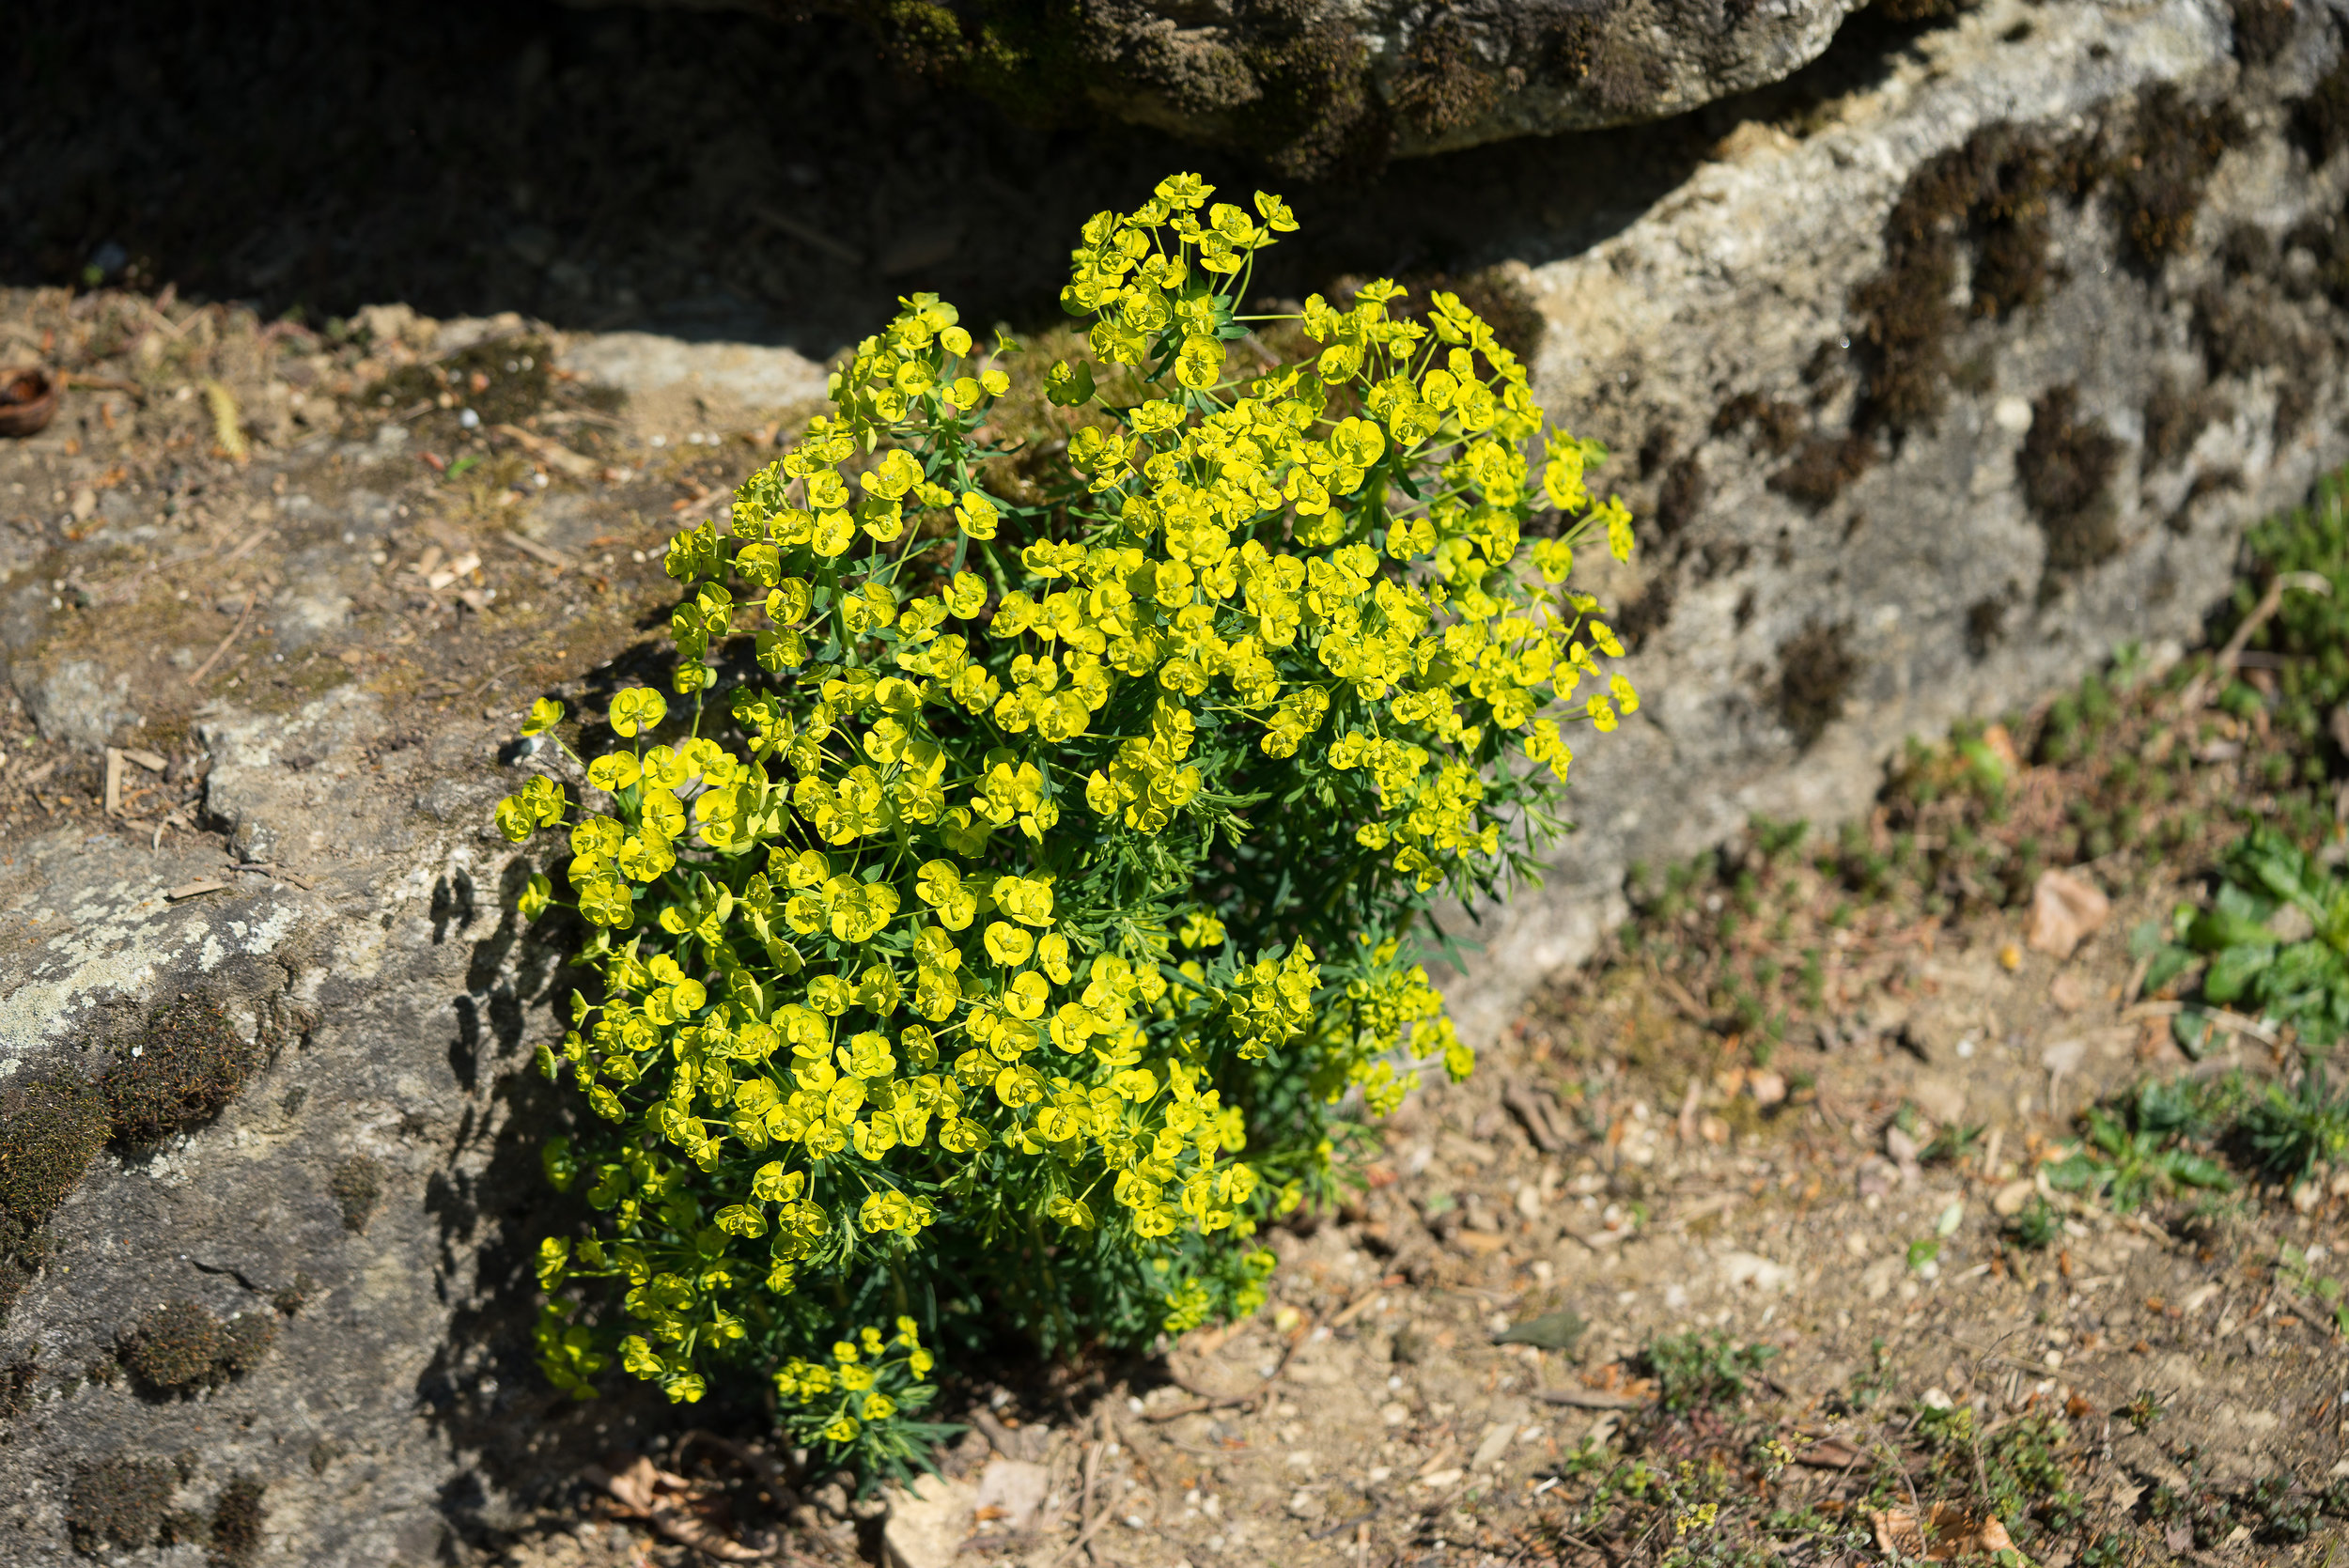 Euphorbia zyparissia (Wolfsmilch) 20.4.2017